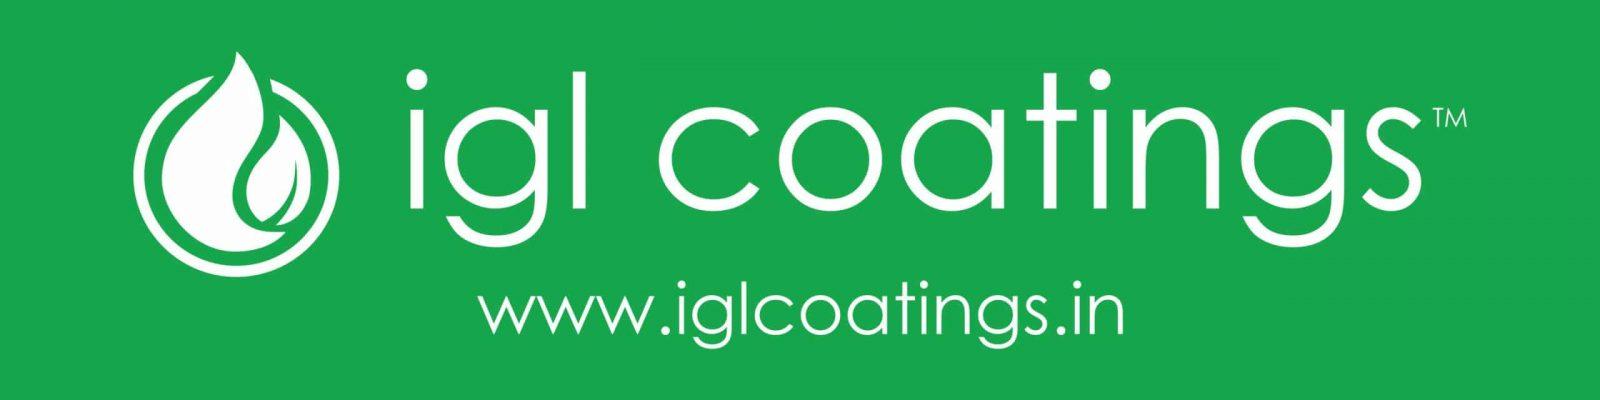 IGL Coatings India